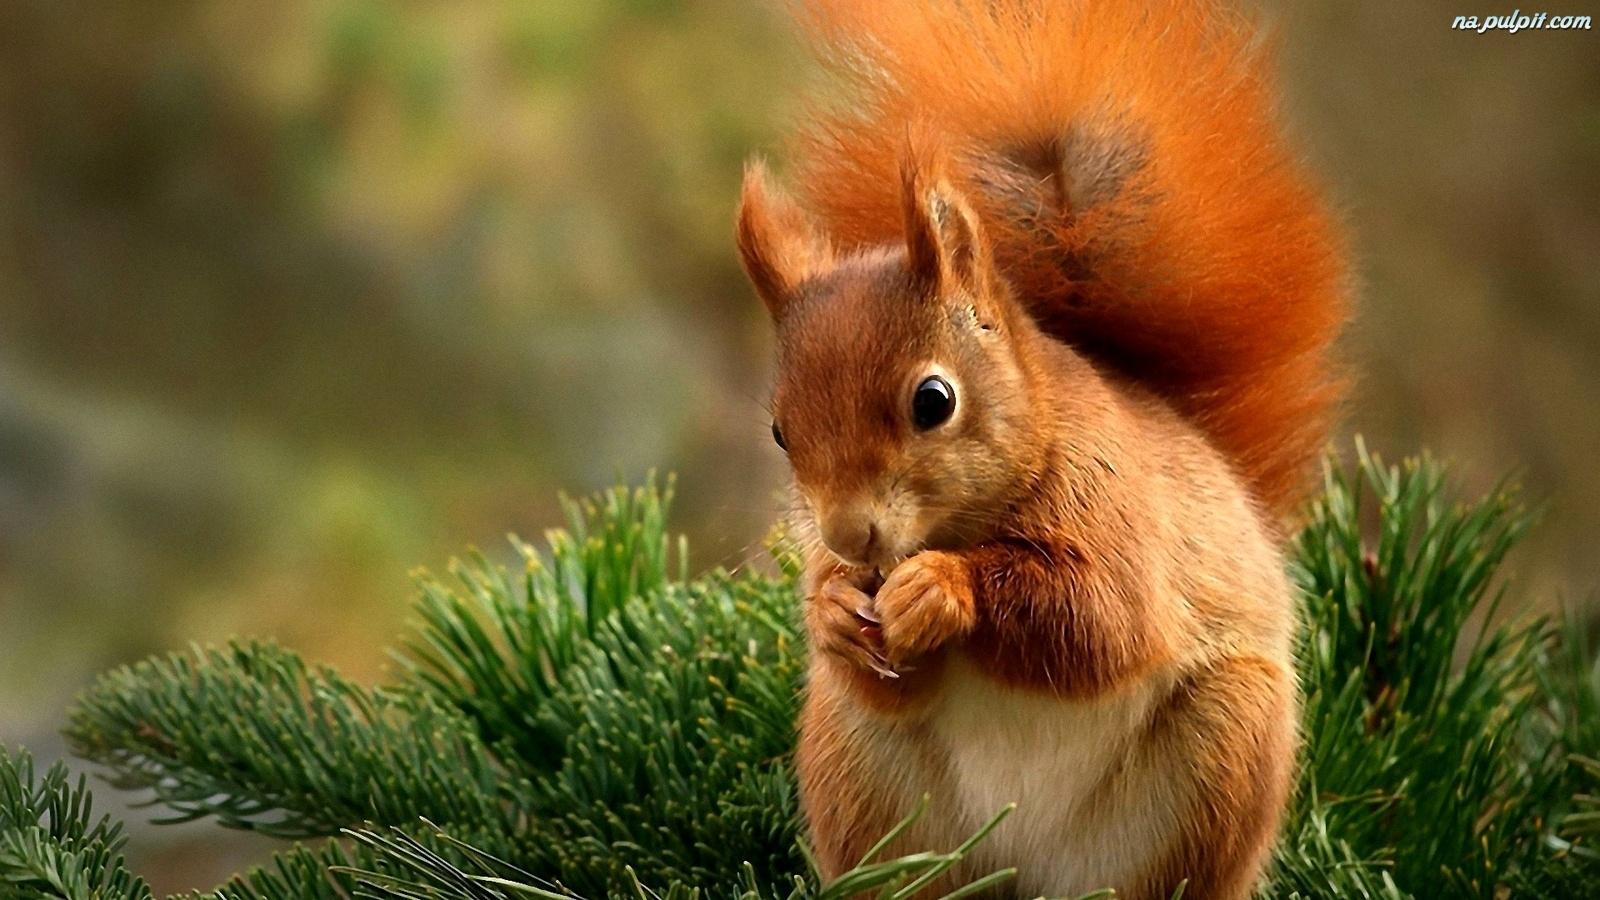 Citate Fotografie Free : Drzewko wiewiórka ruda iglaste na pulpit